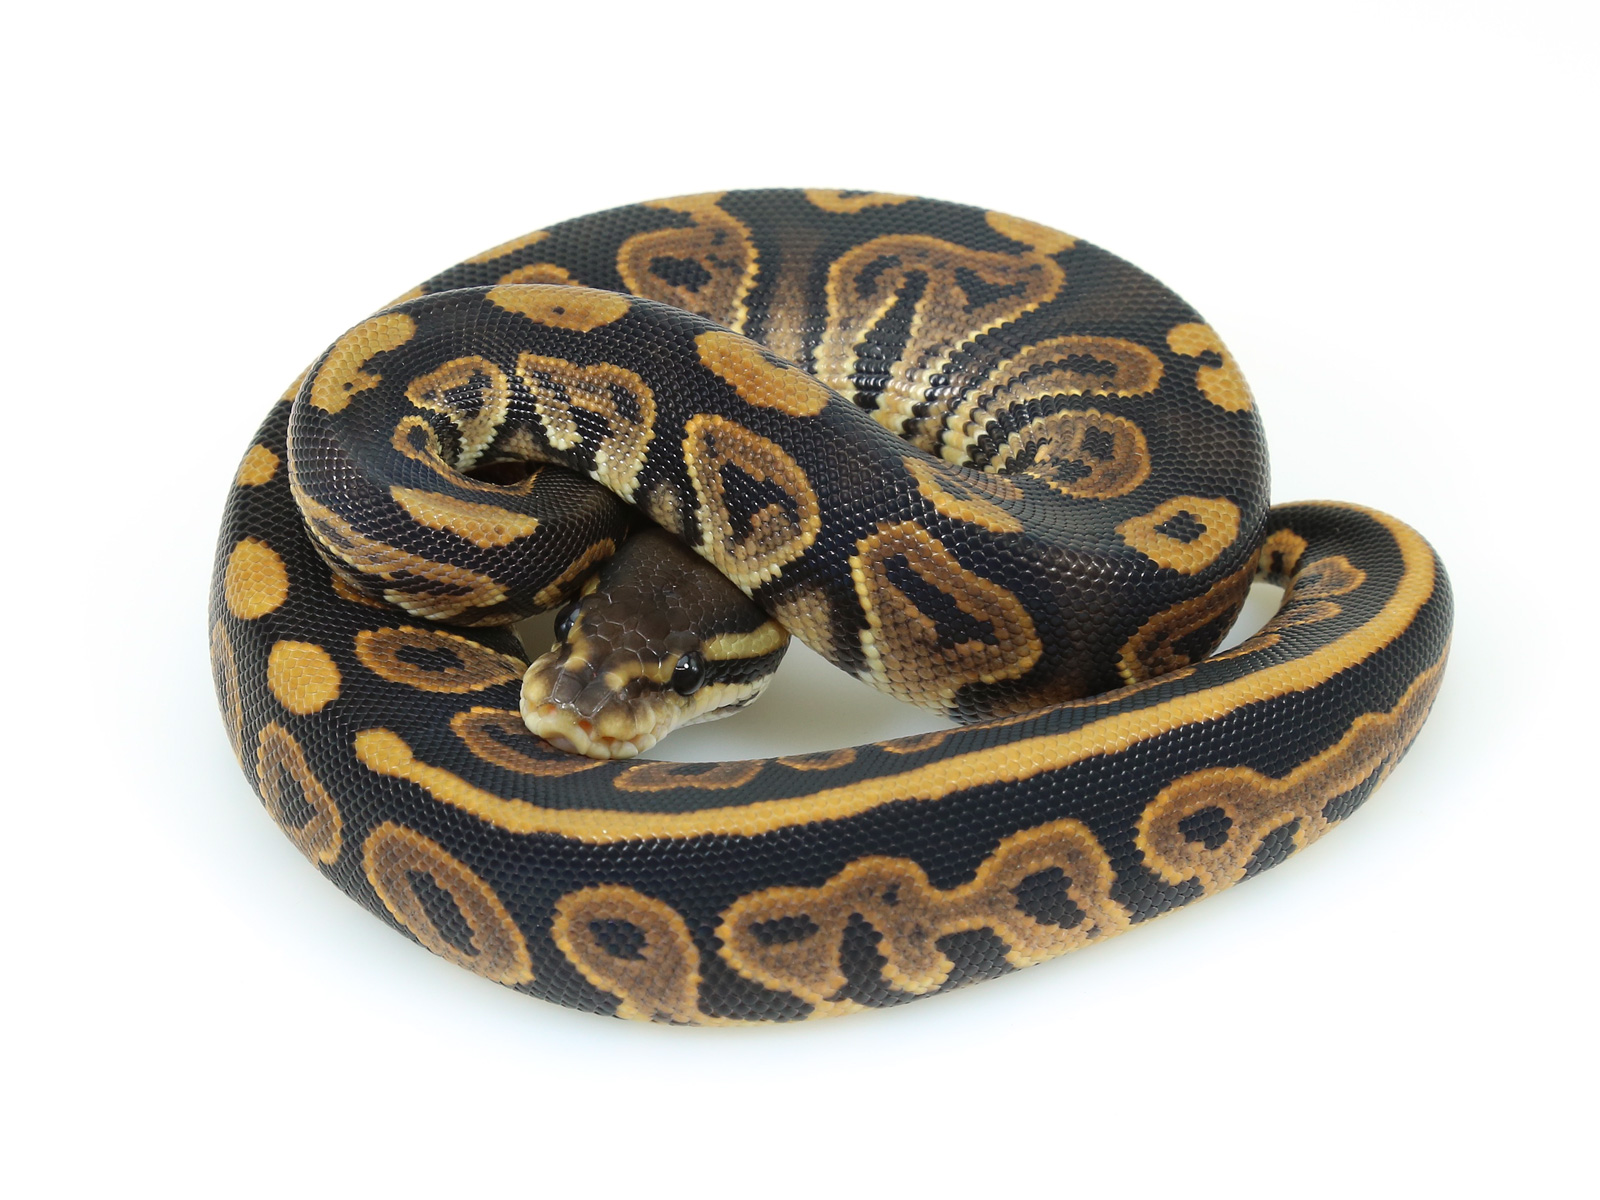 ball python, black pastel